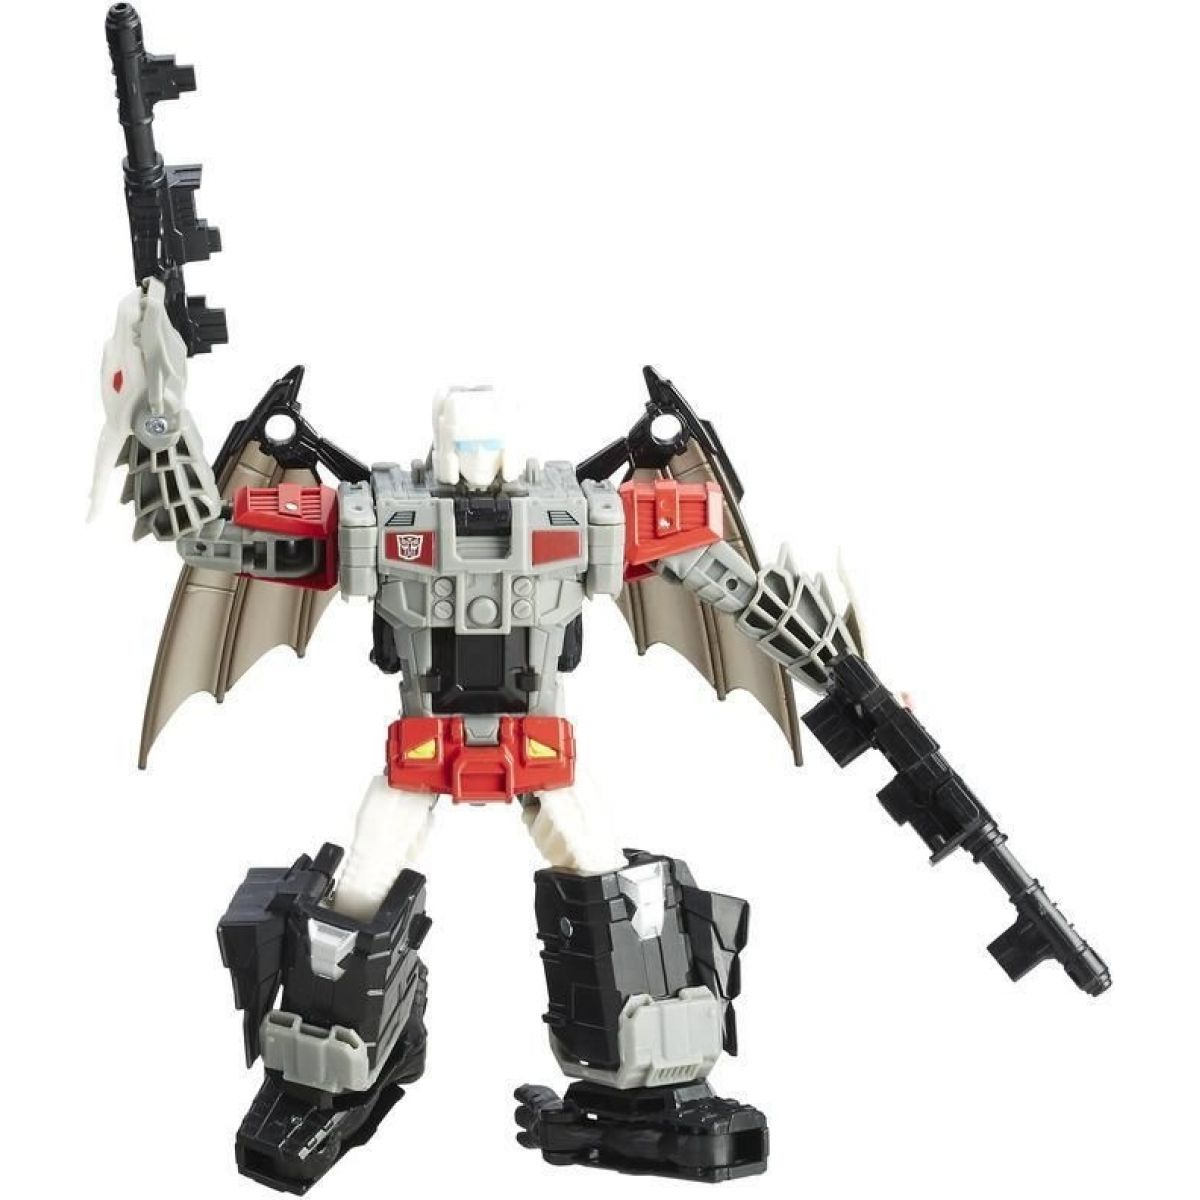 Hasbro Transformers Generations Titans Return Dabur